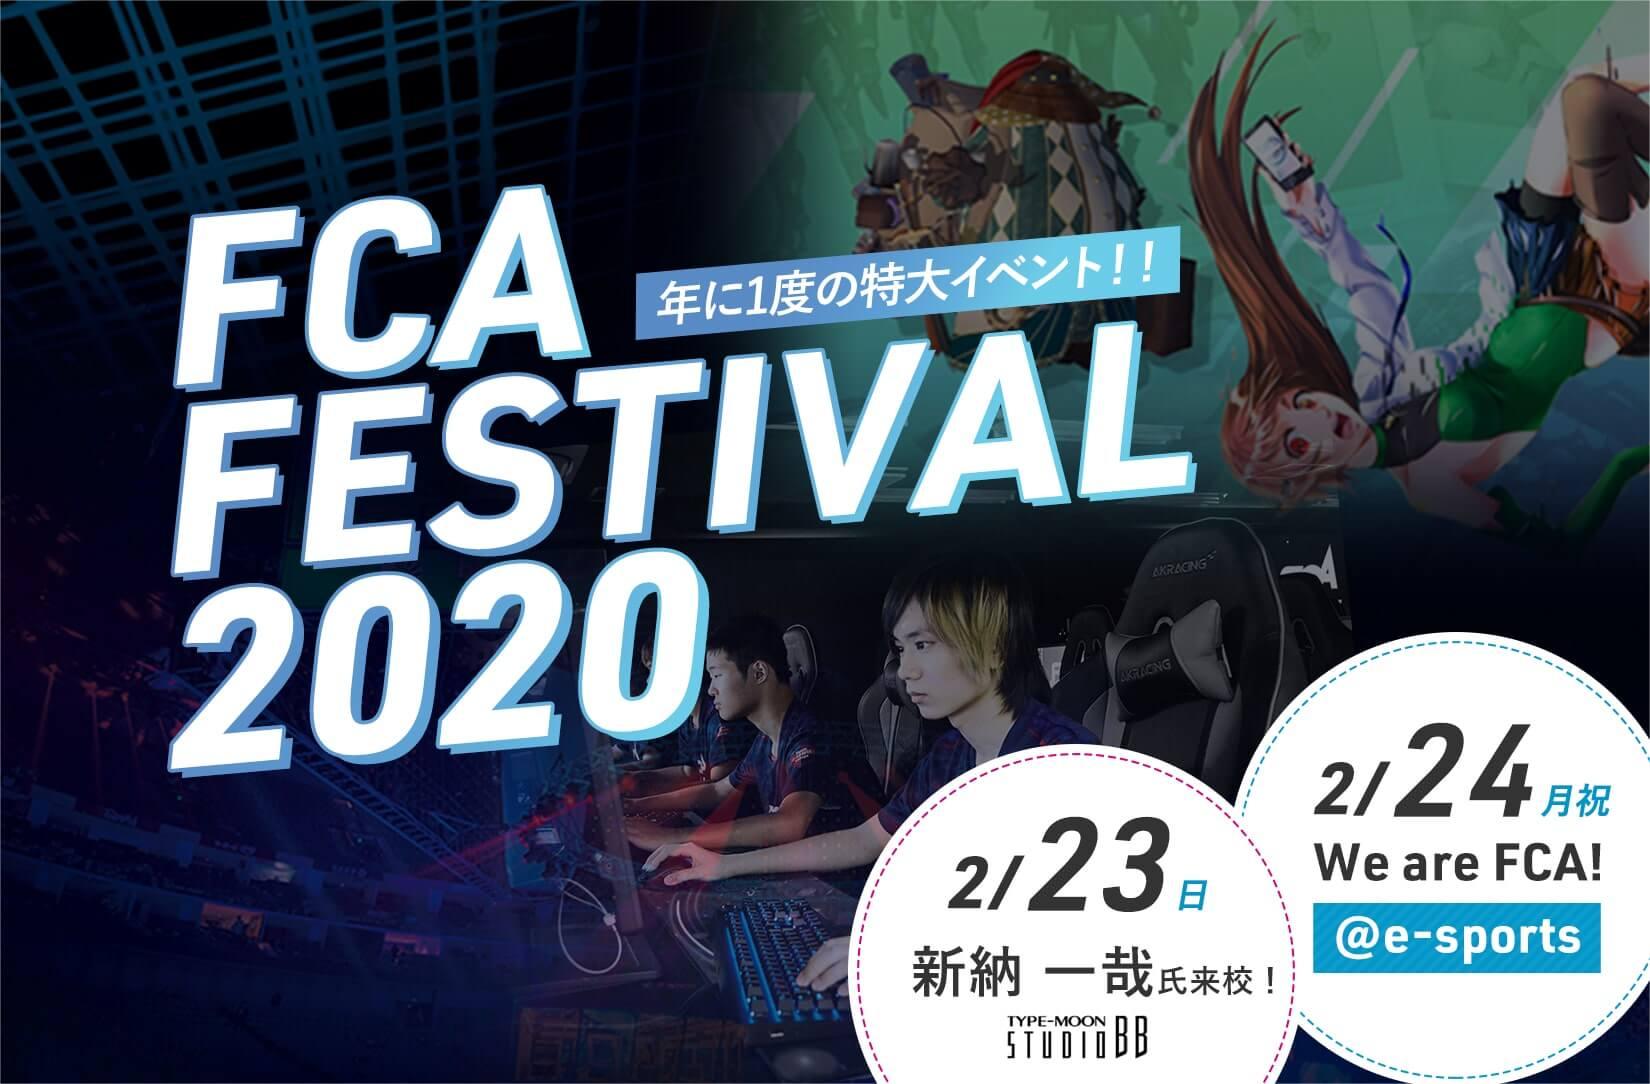 TECH.C.福岡 FESTIVAL 2020